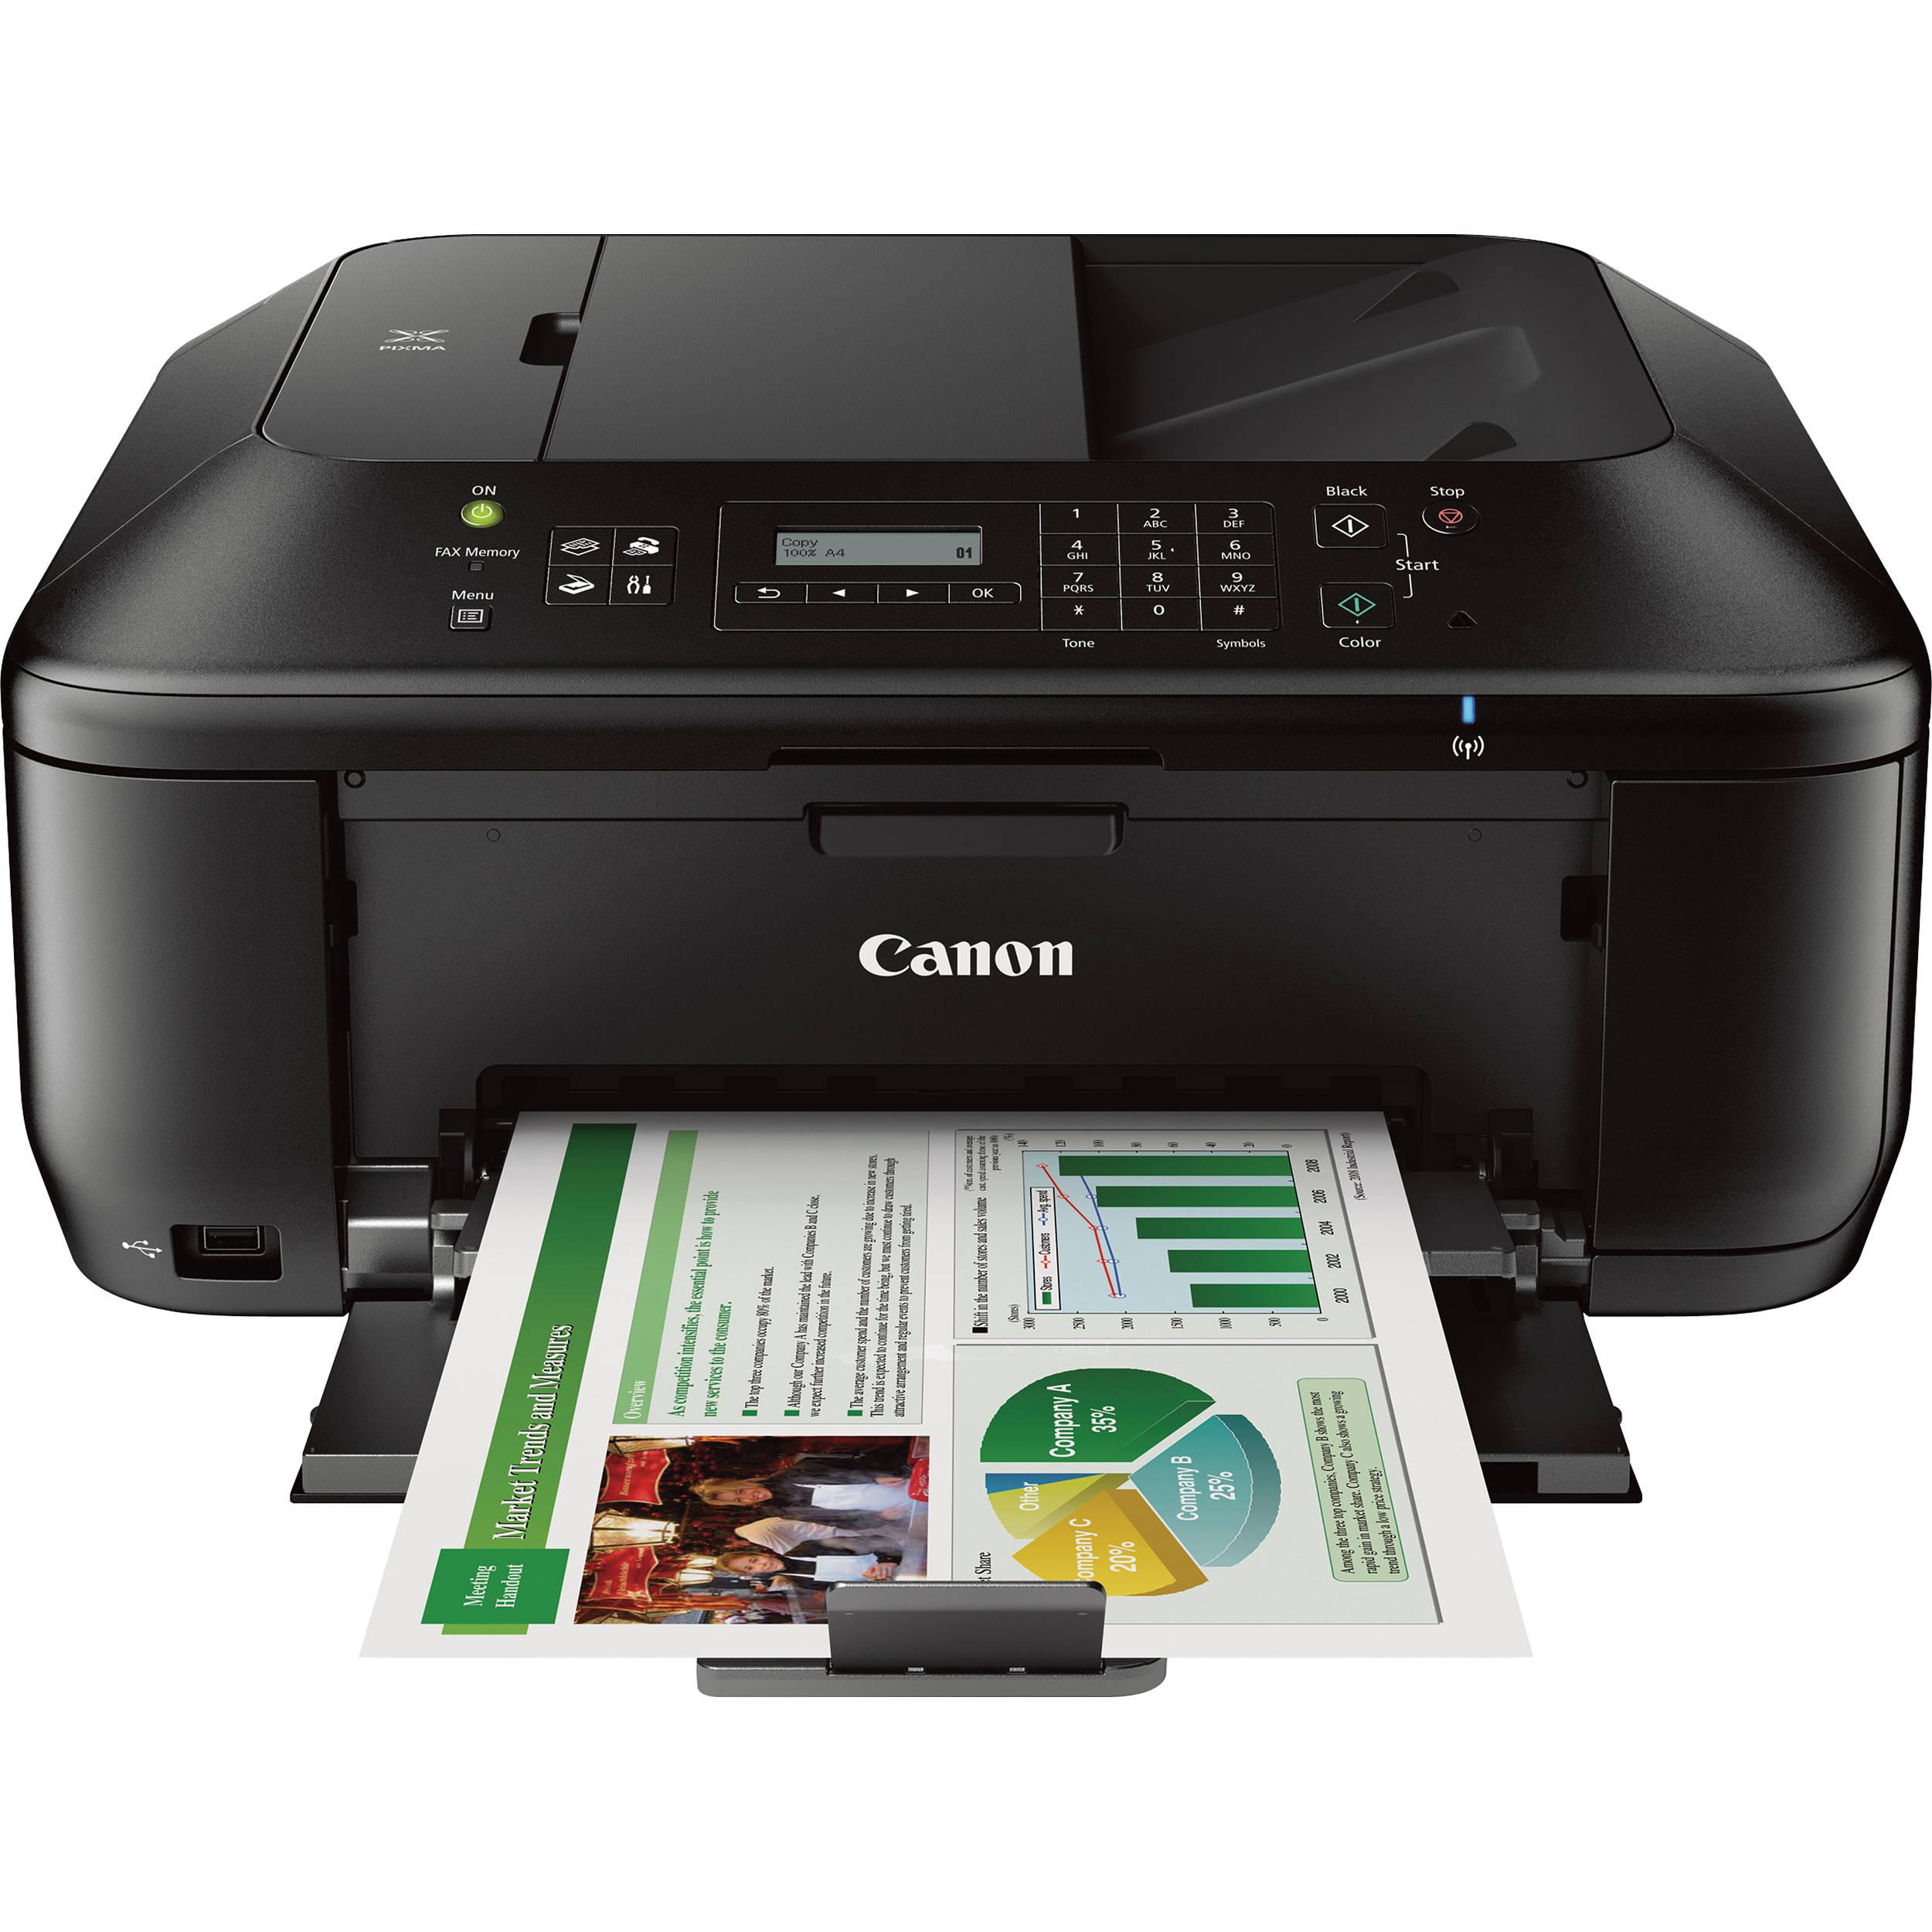 Color printer wireless - Canon Pixma Mx532 Wireless All In One Inkjet Printer